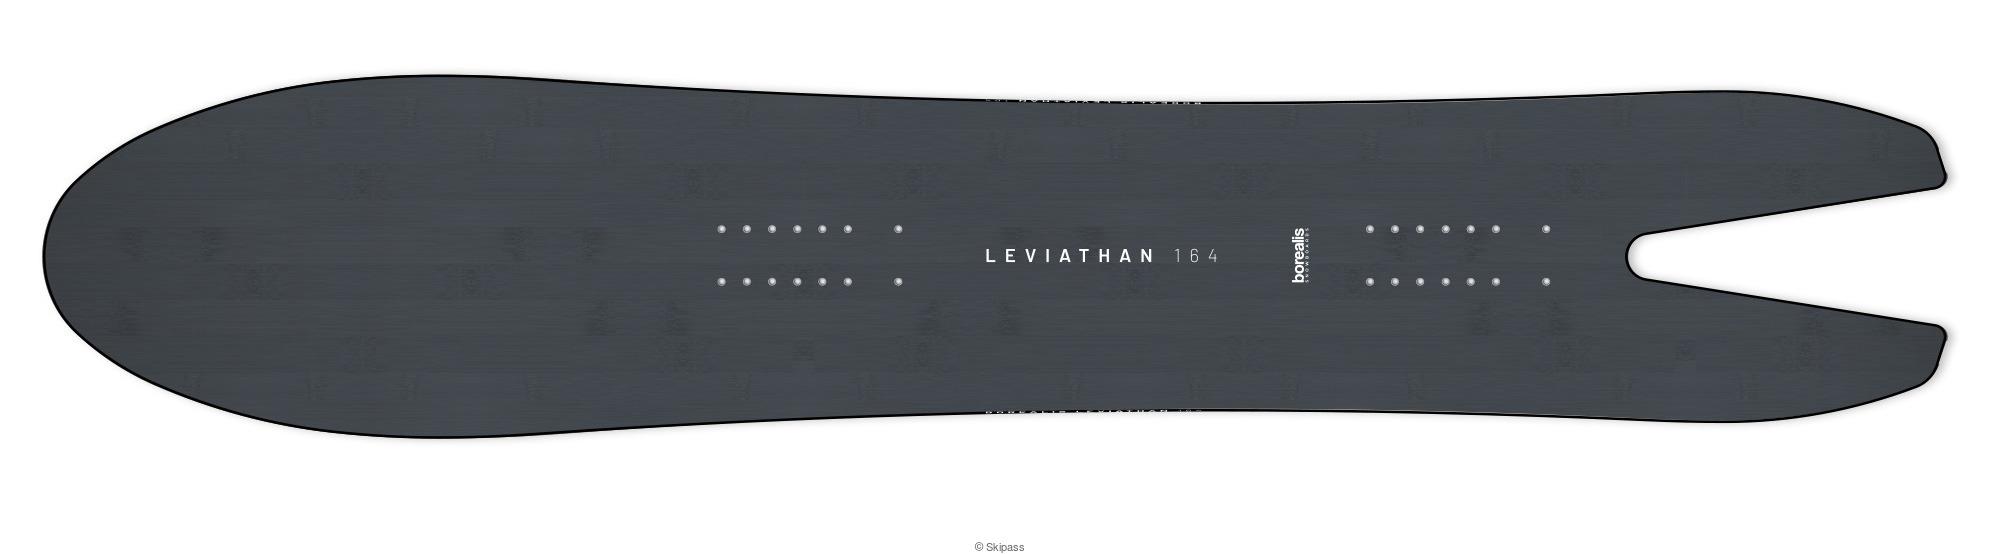 Borealis LEVIATHAN